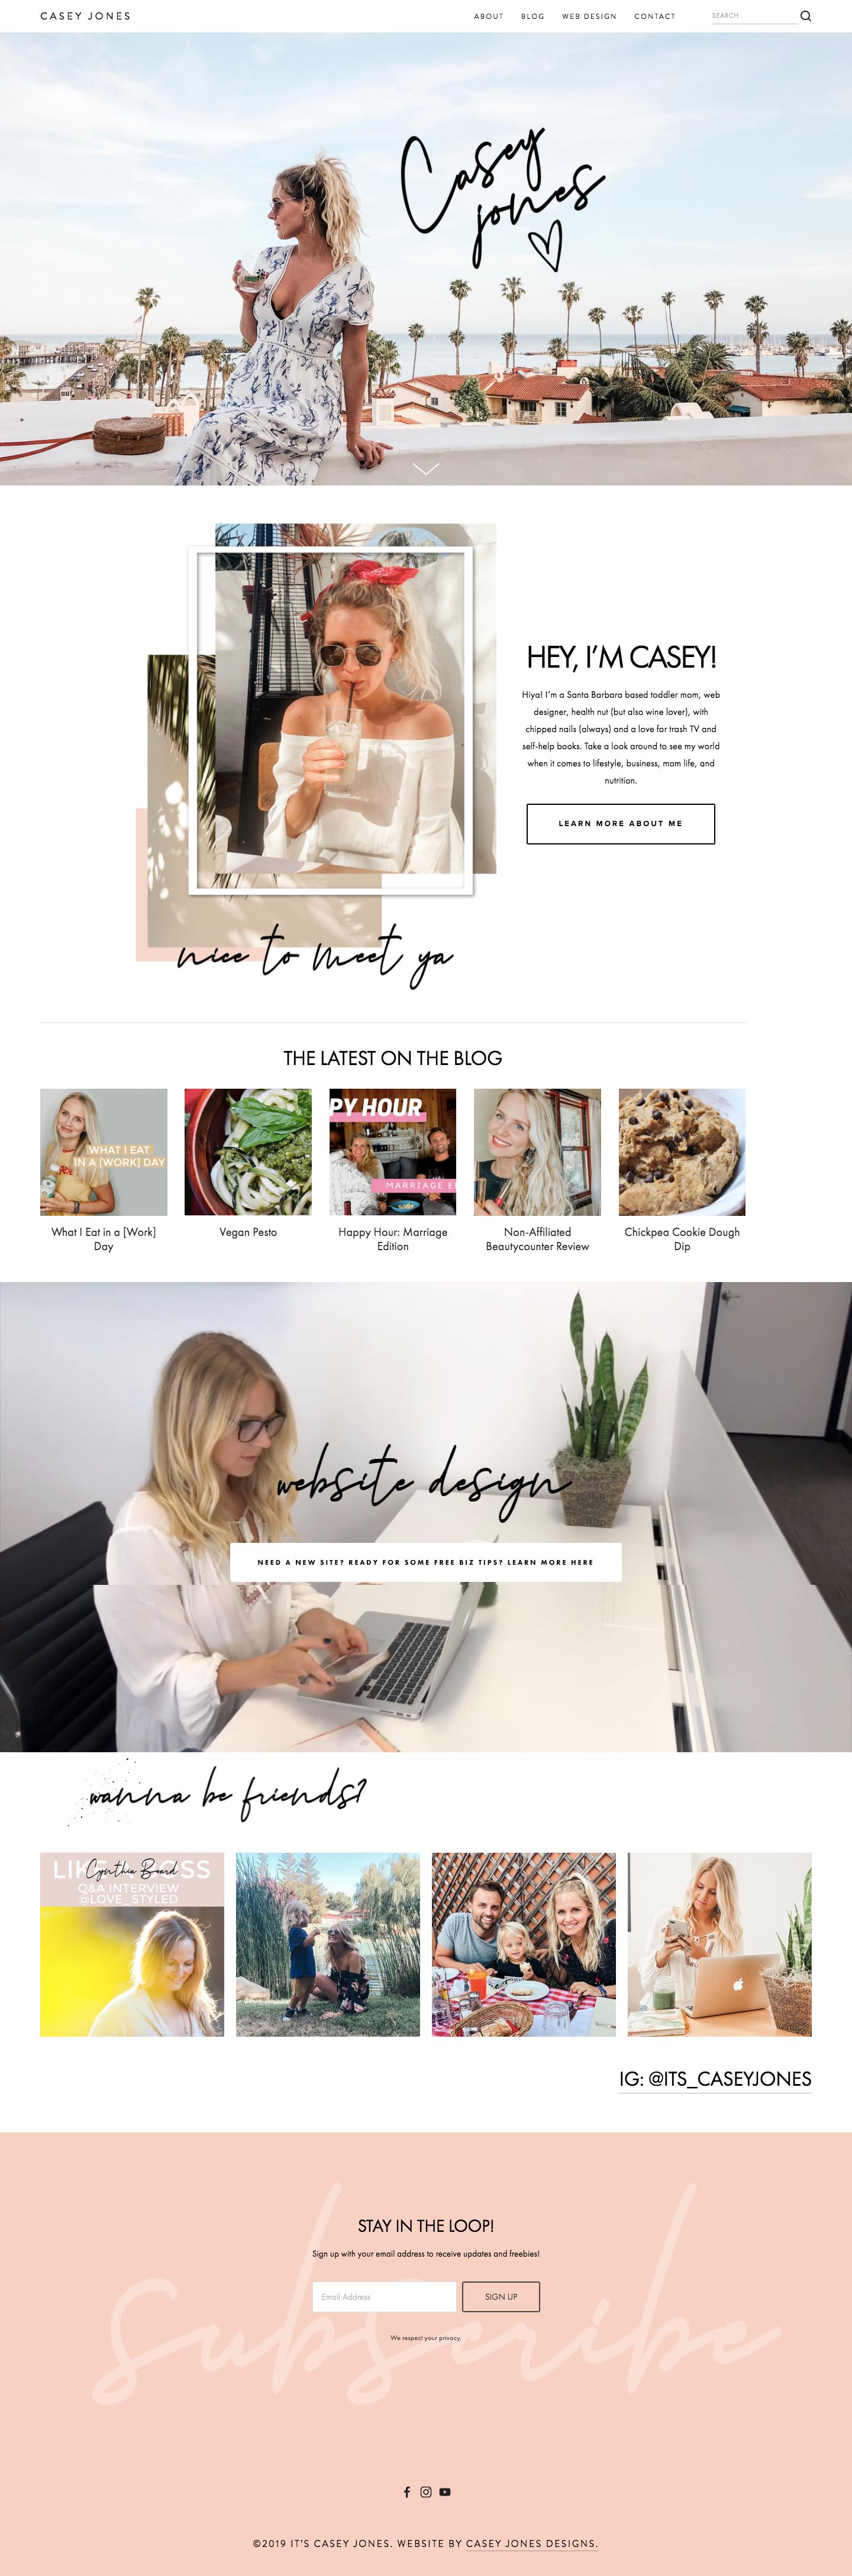 Lifestyle blog custom Squarespace design by Casey Jones Designs